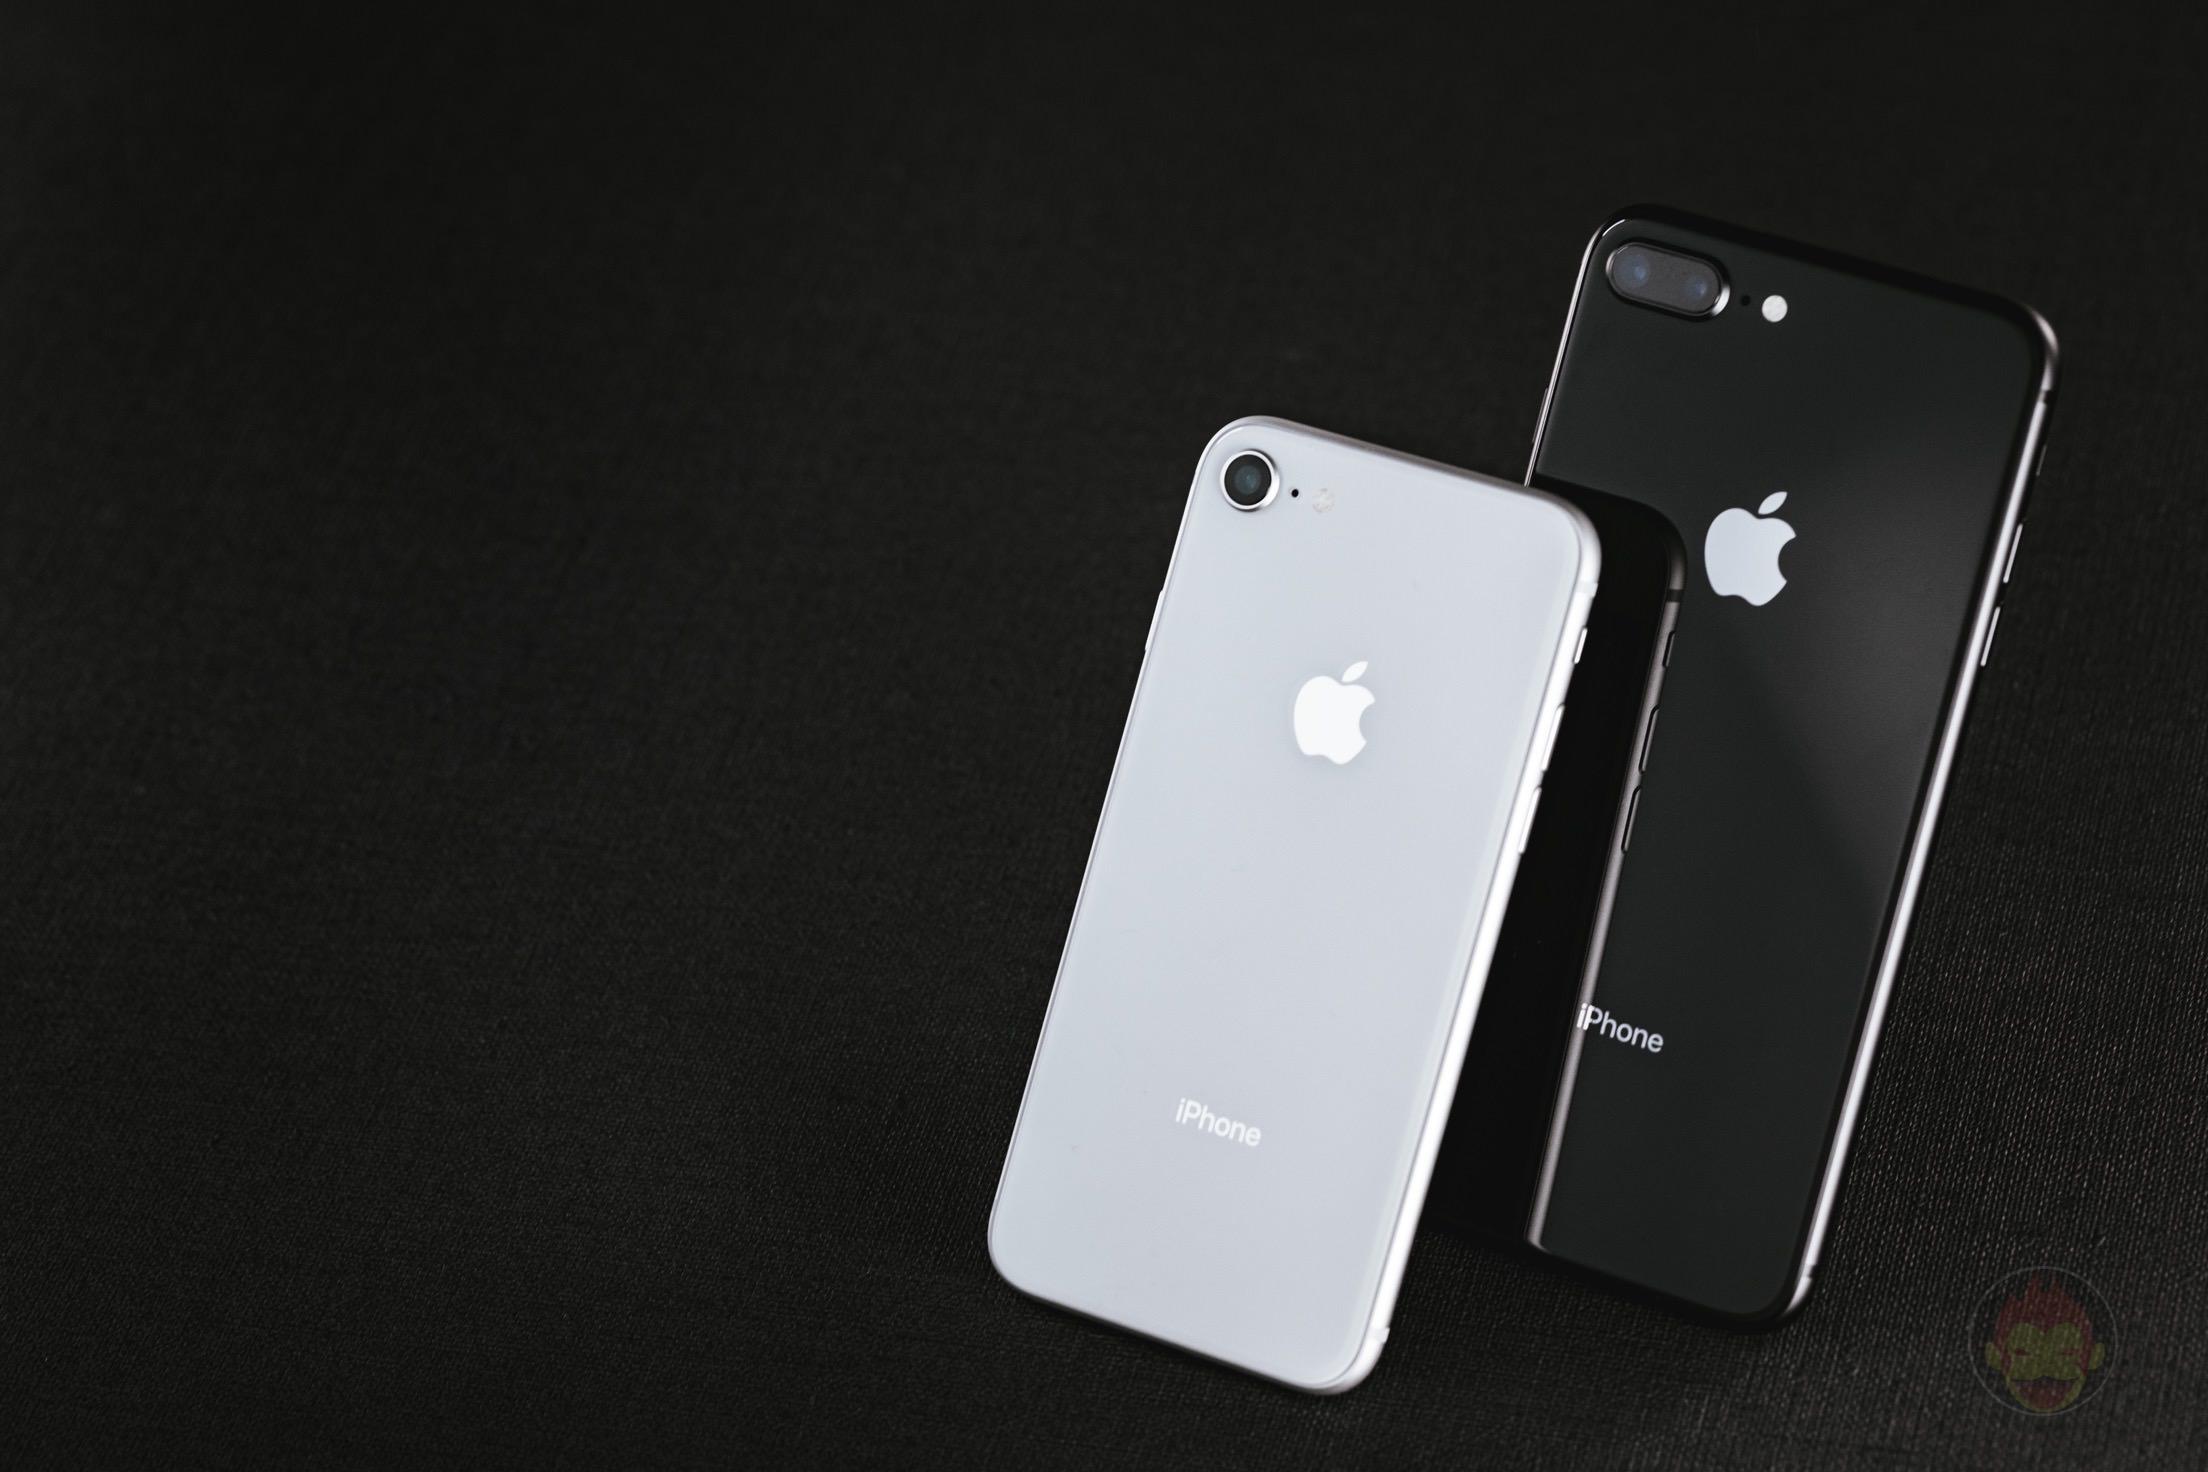 iPhone8-8Plus-Review-10.jpg